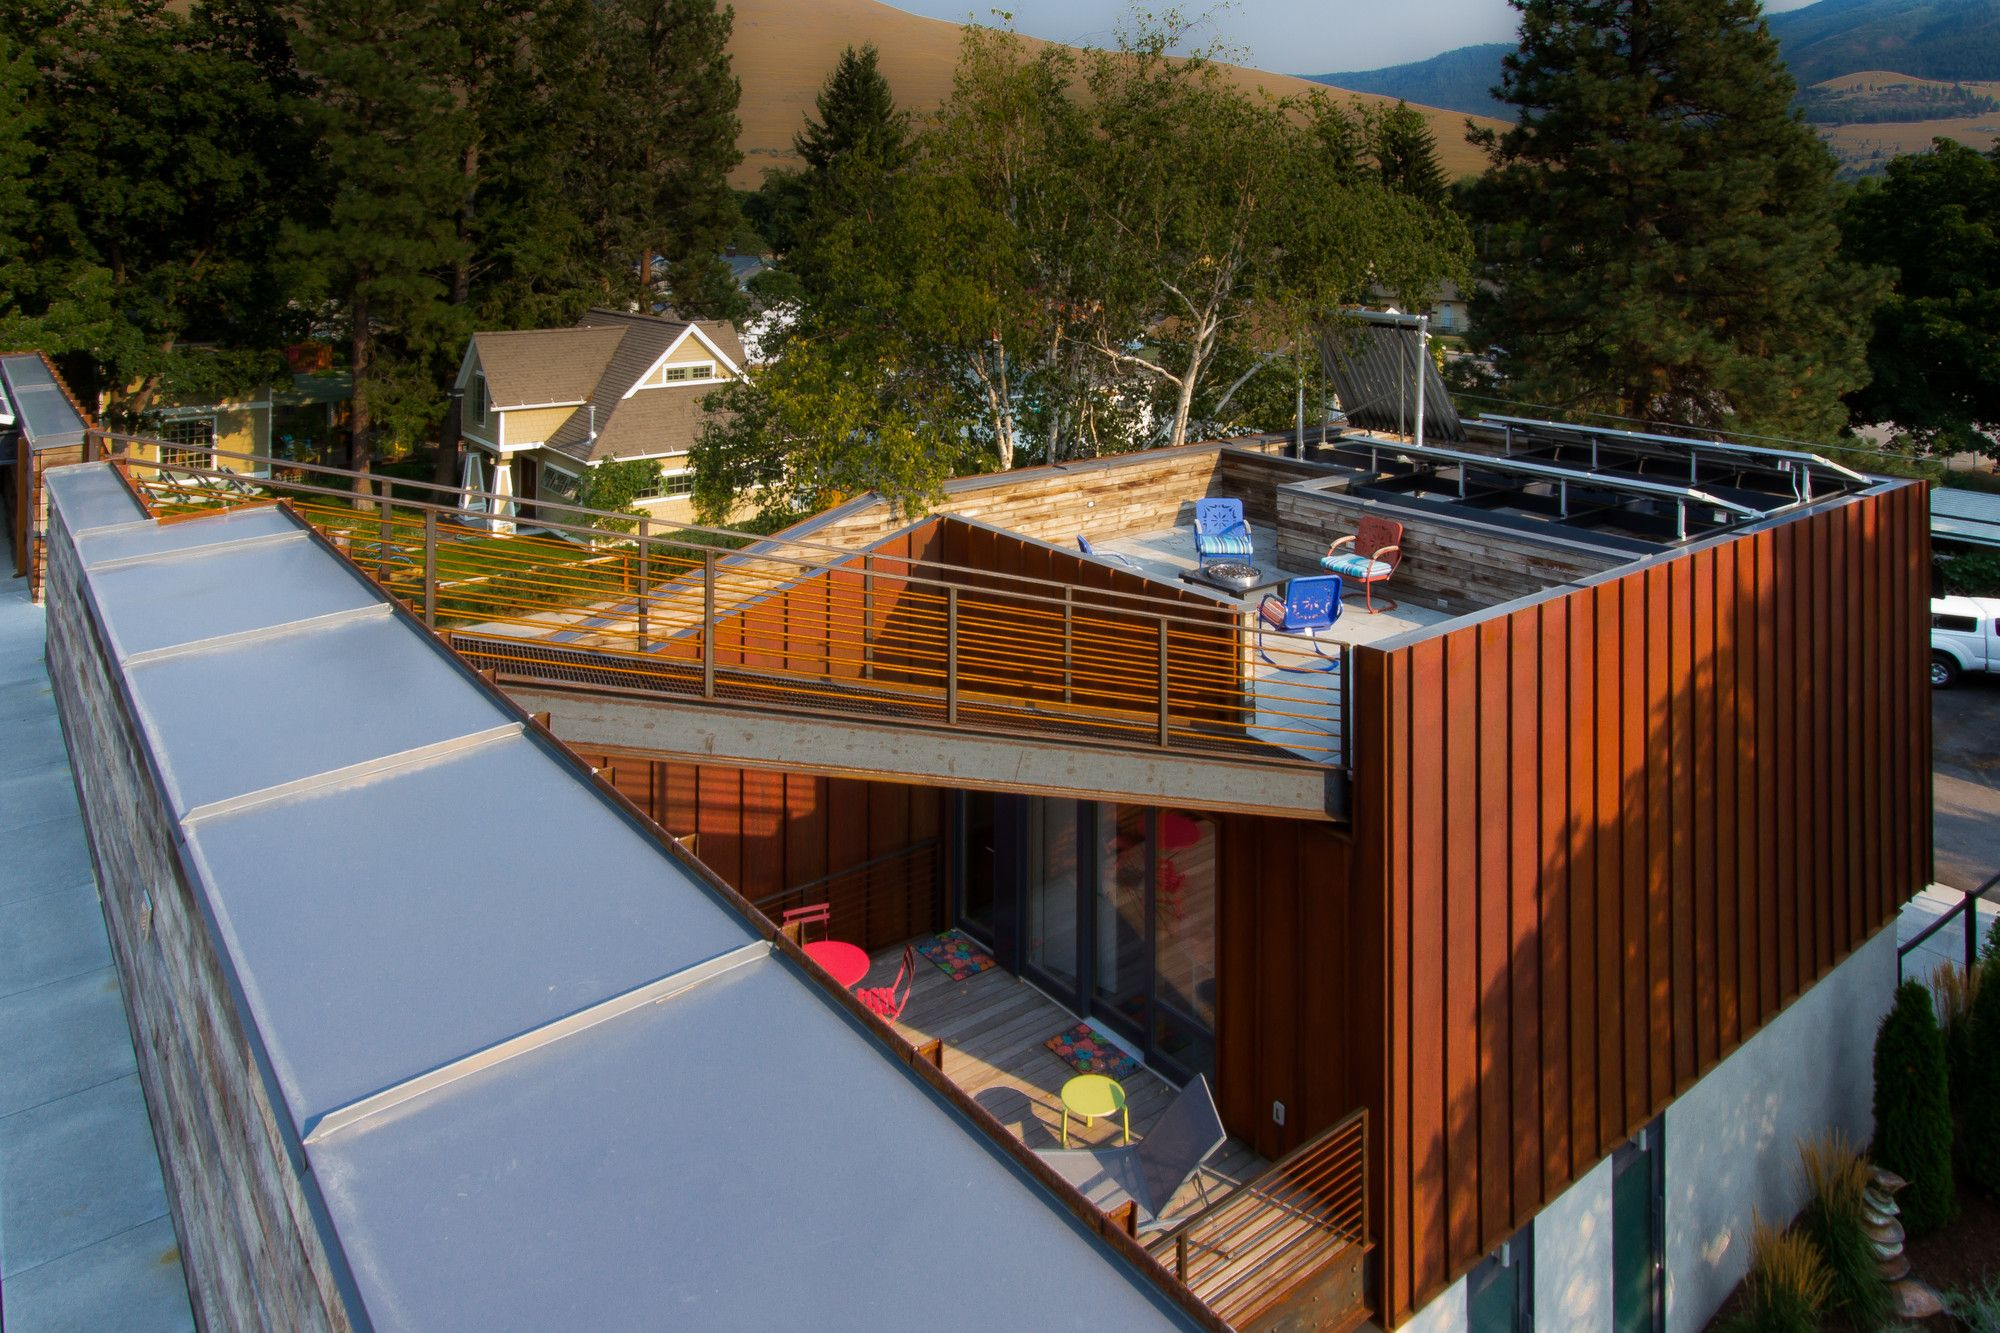 Gallery Of Wren Residence Chris Pardo Design Elemental Architecture 16 Wren House Roof Terrace Design Architecture